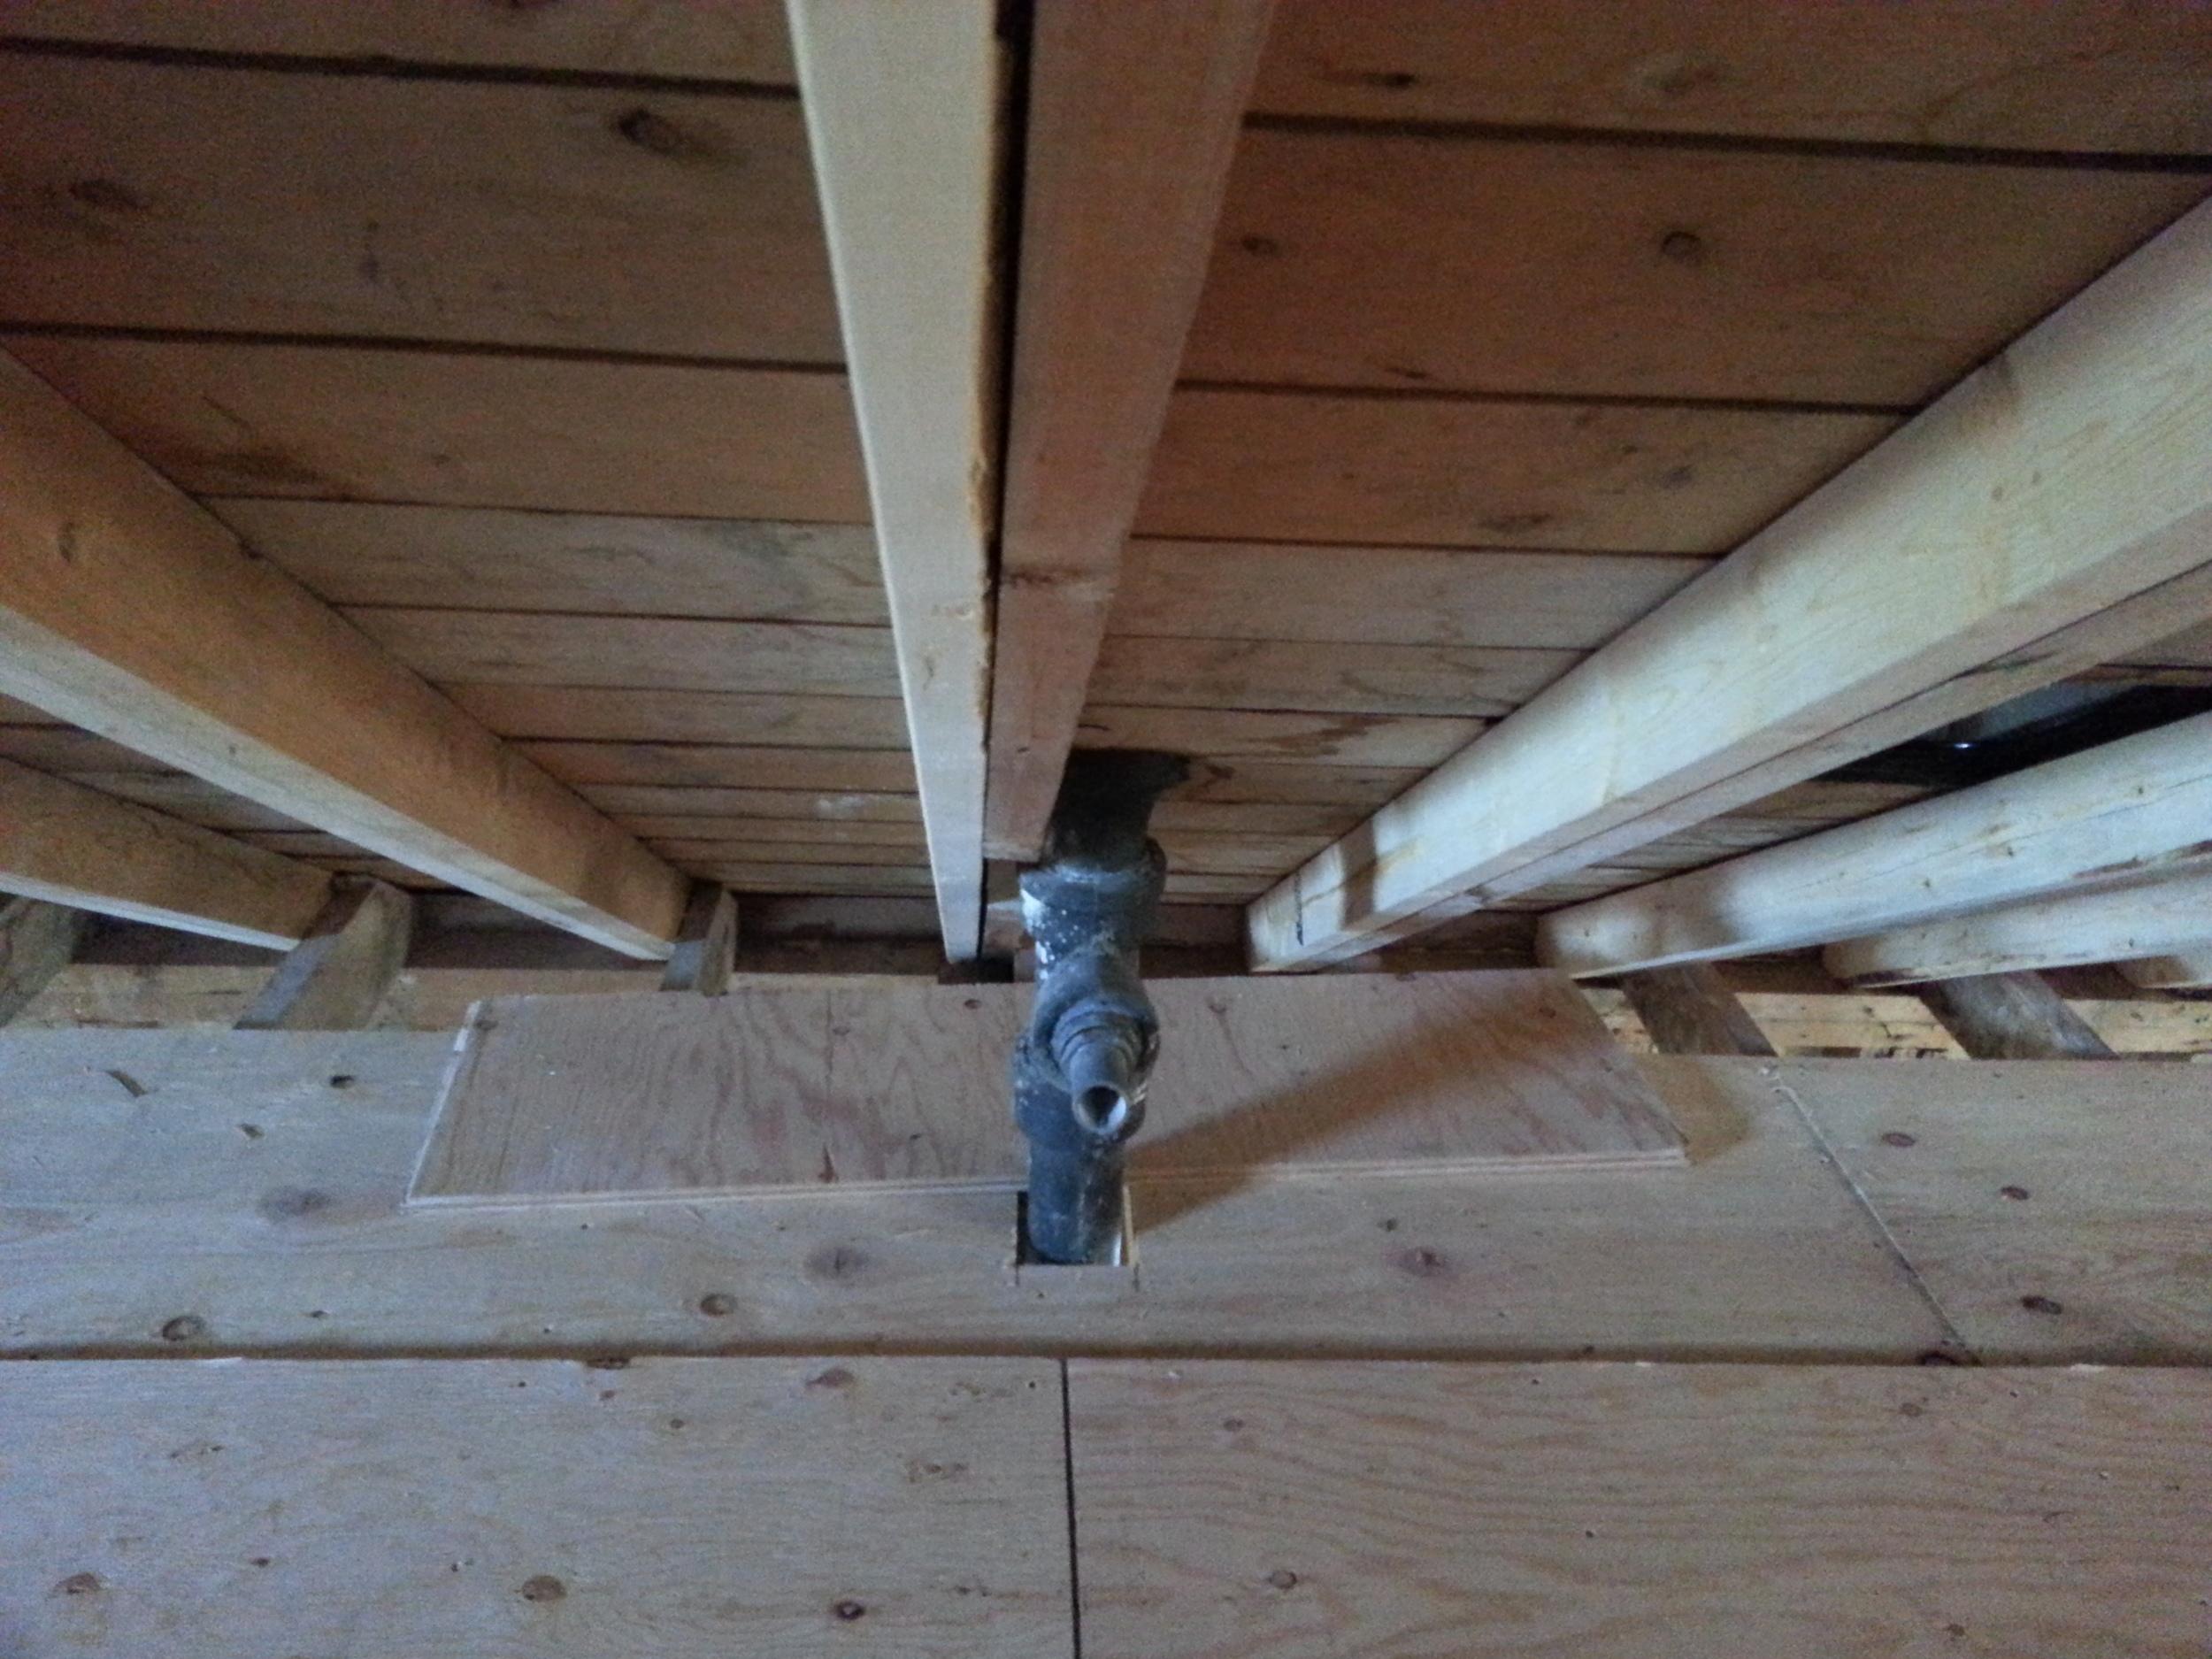 20130904_174054 - plumbing stack.jpg